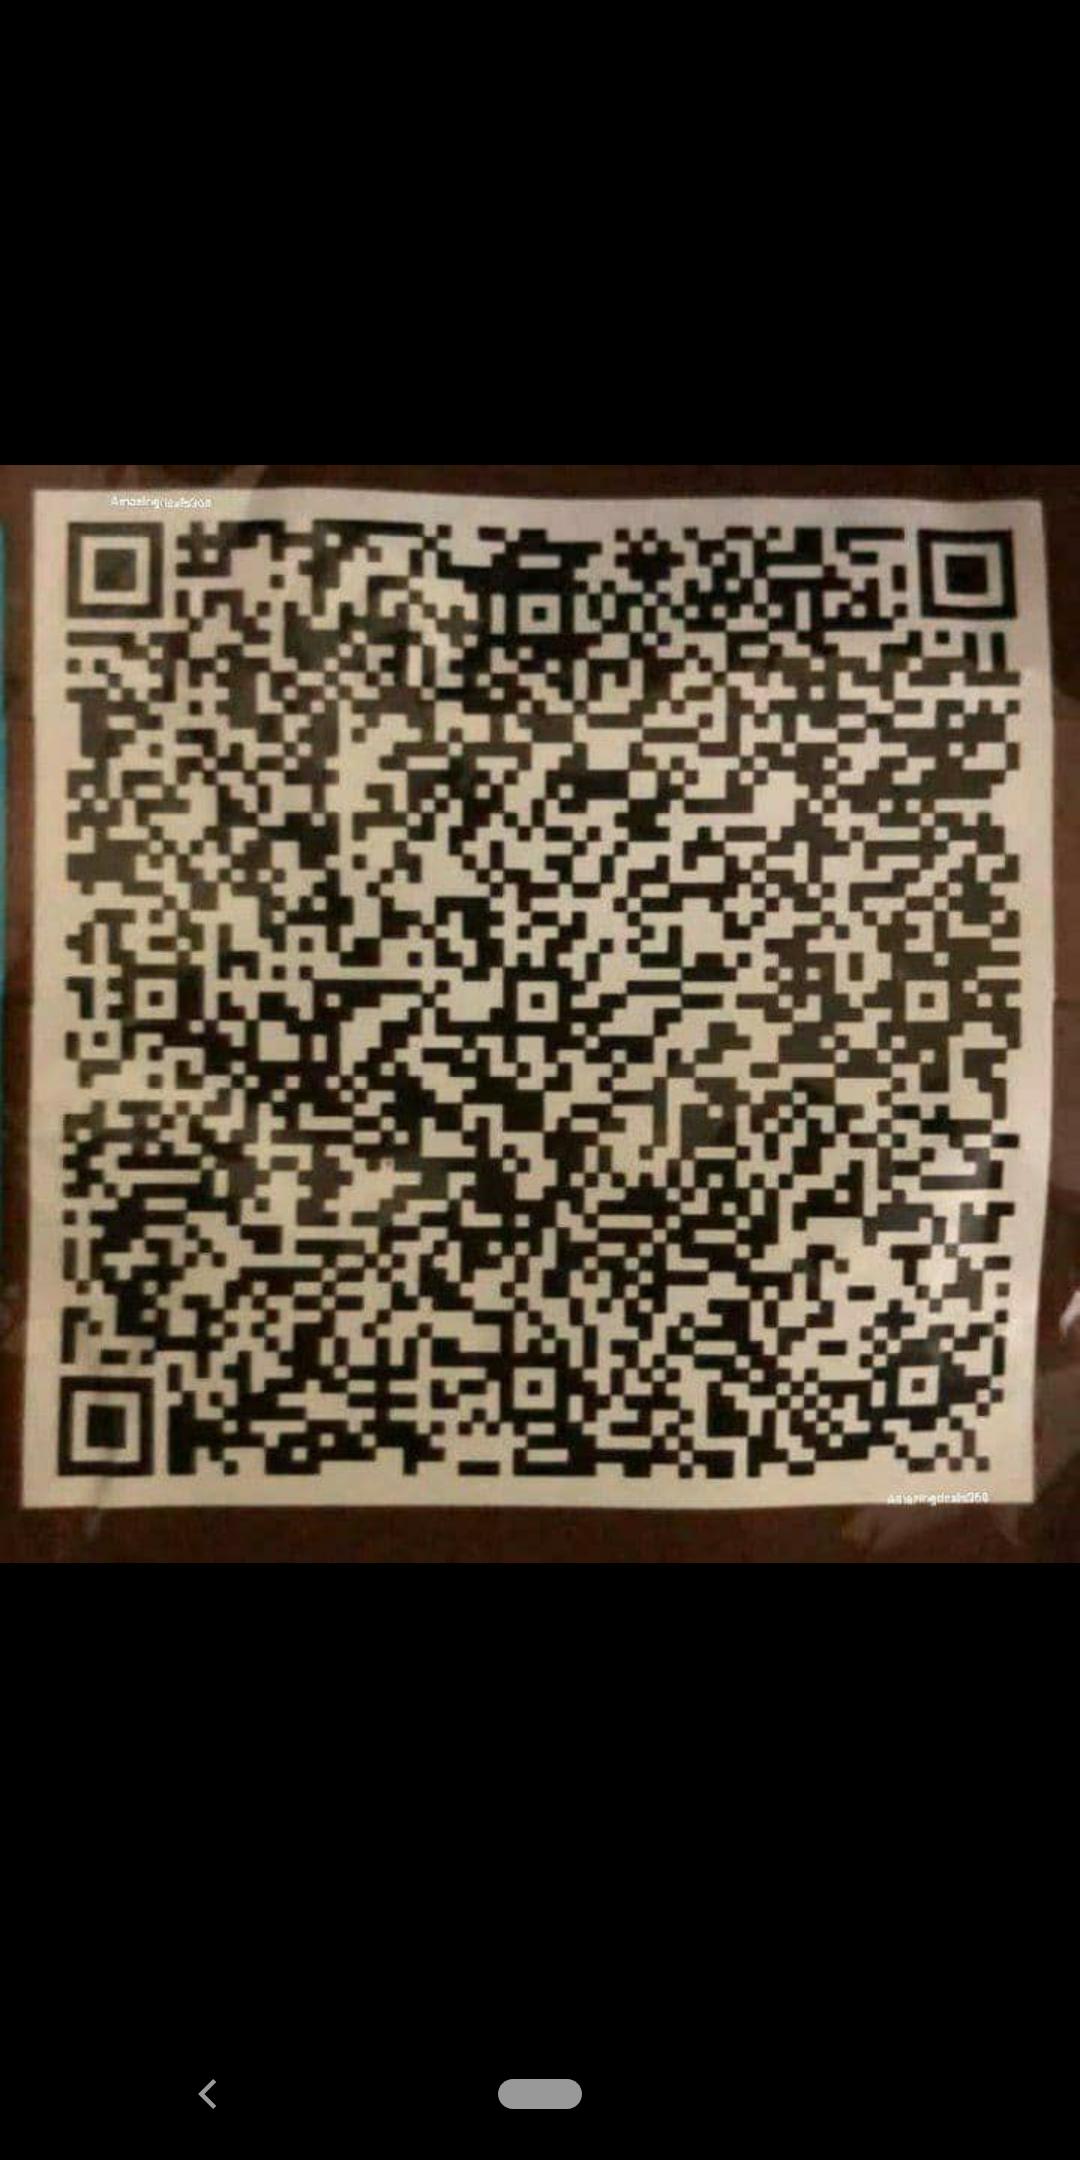 https://cdn0.desidime.com/attachments/photos/663956/original/Screenshot_20210207-070017.png?1612661487